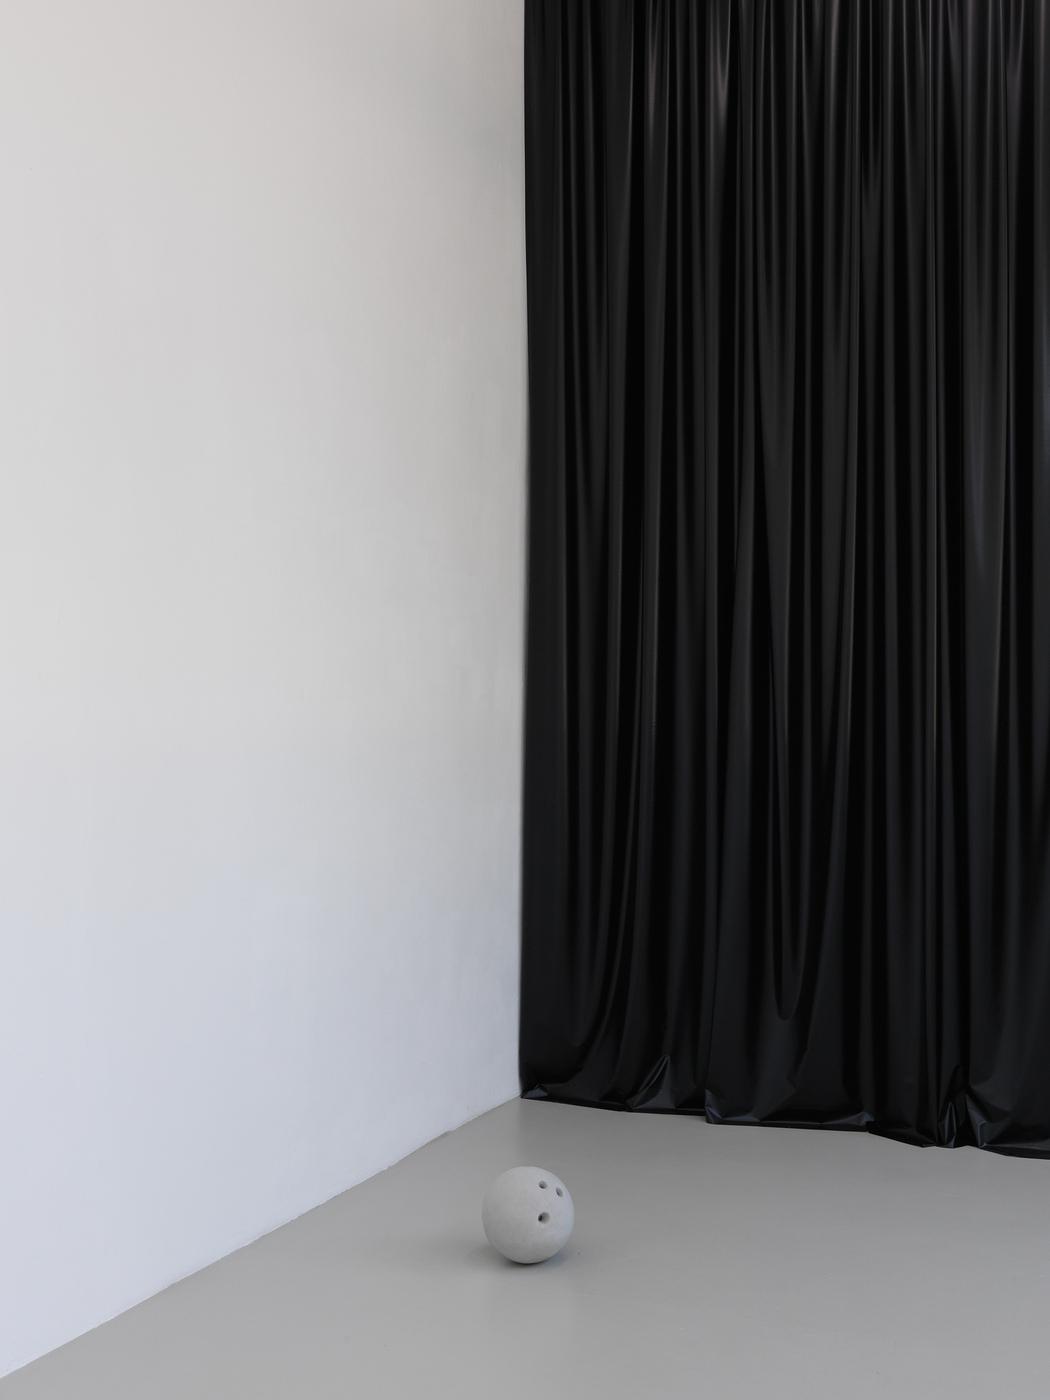 20_Gestures of Tomorrow_Nona Inescu